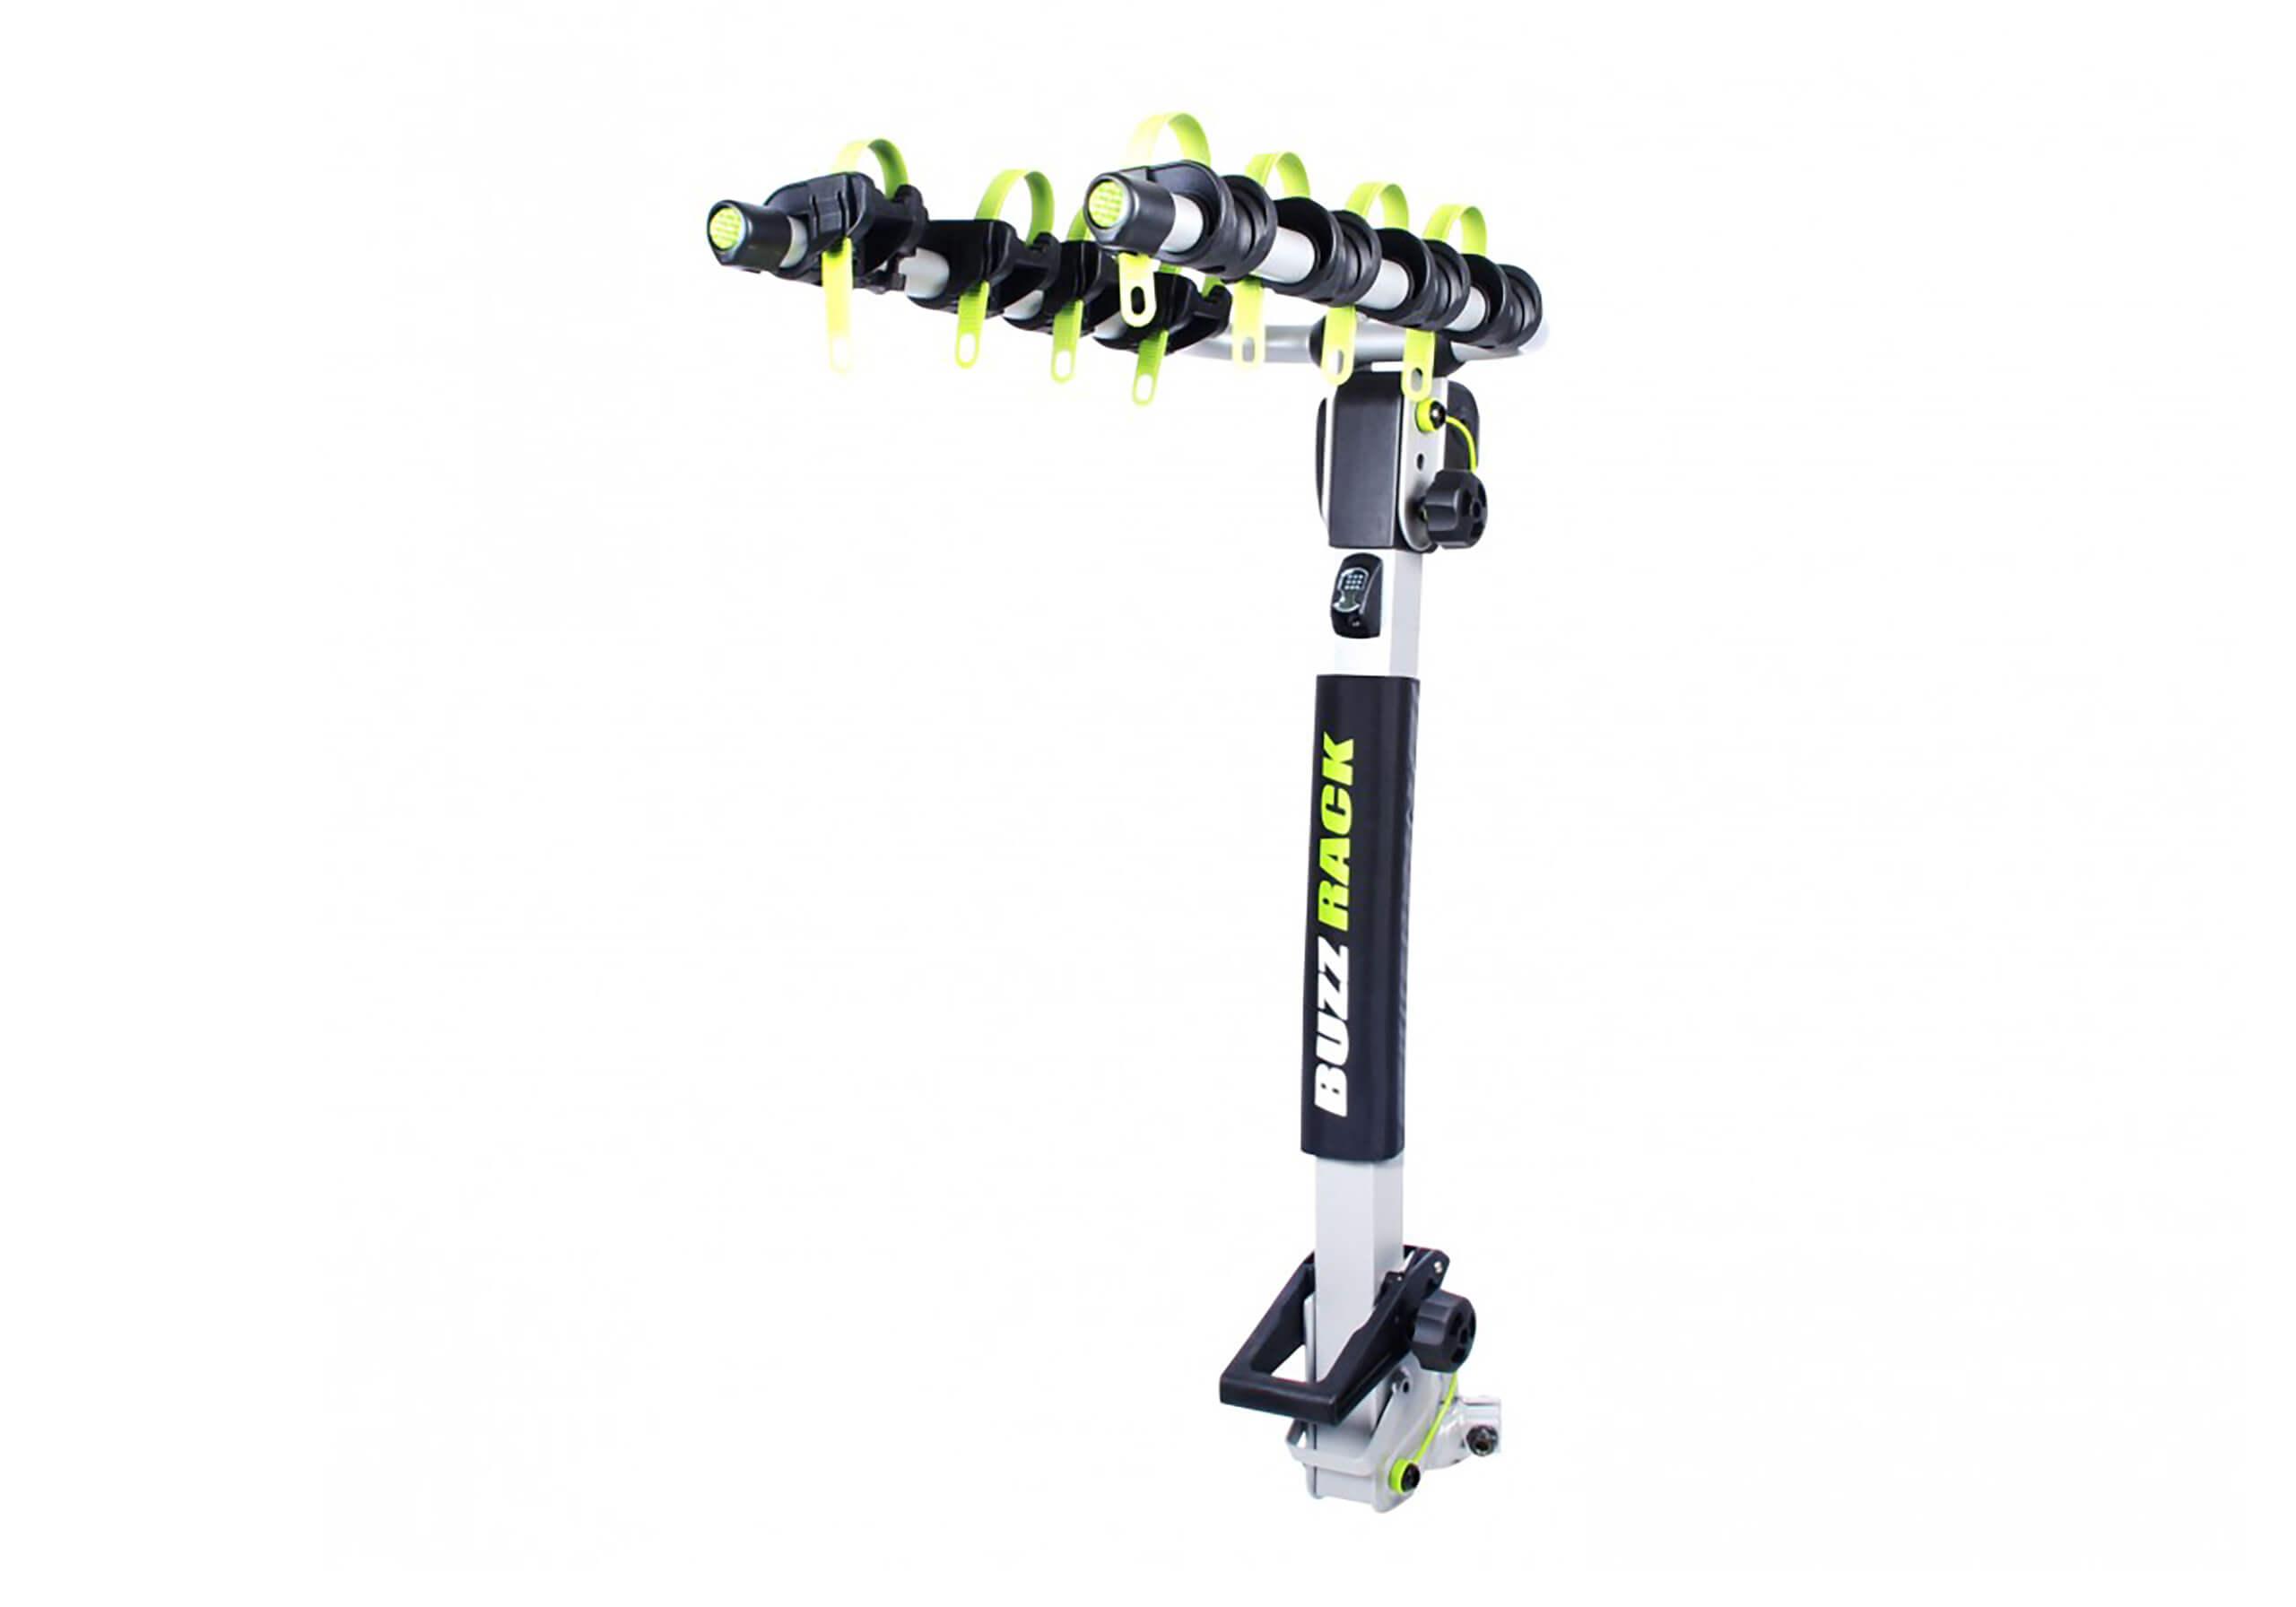 tow bar mounted bike racks tow bar